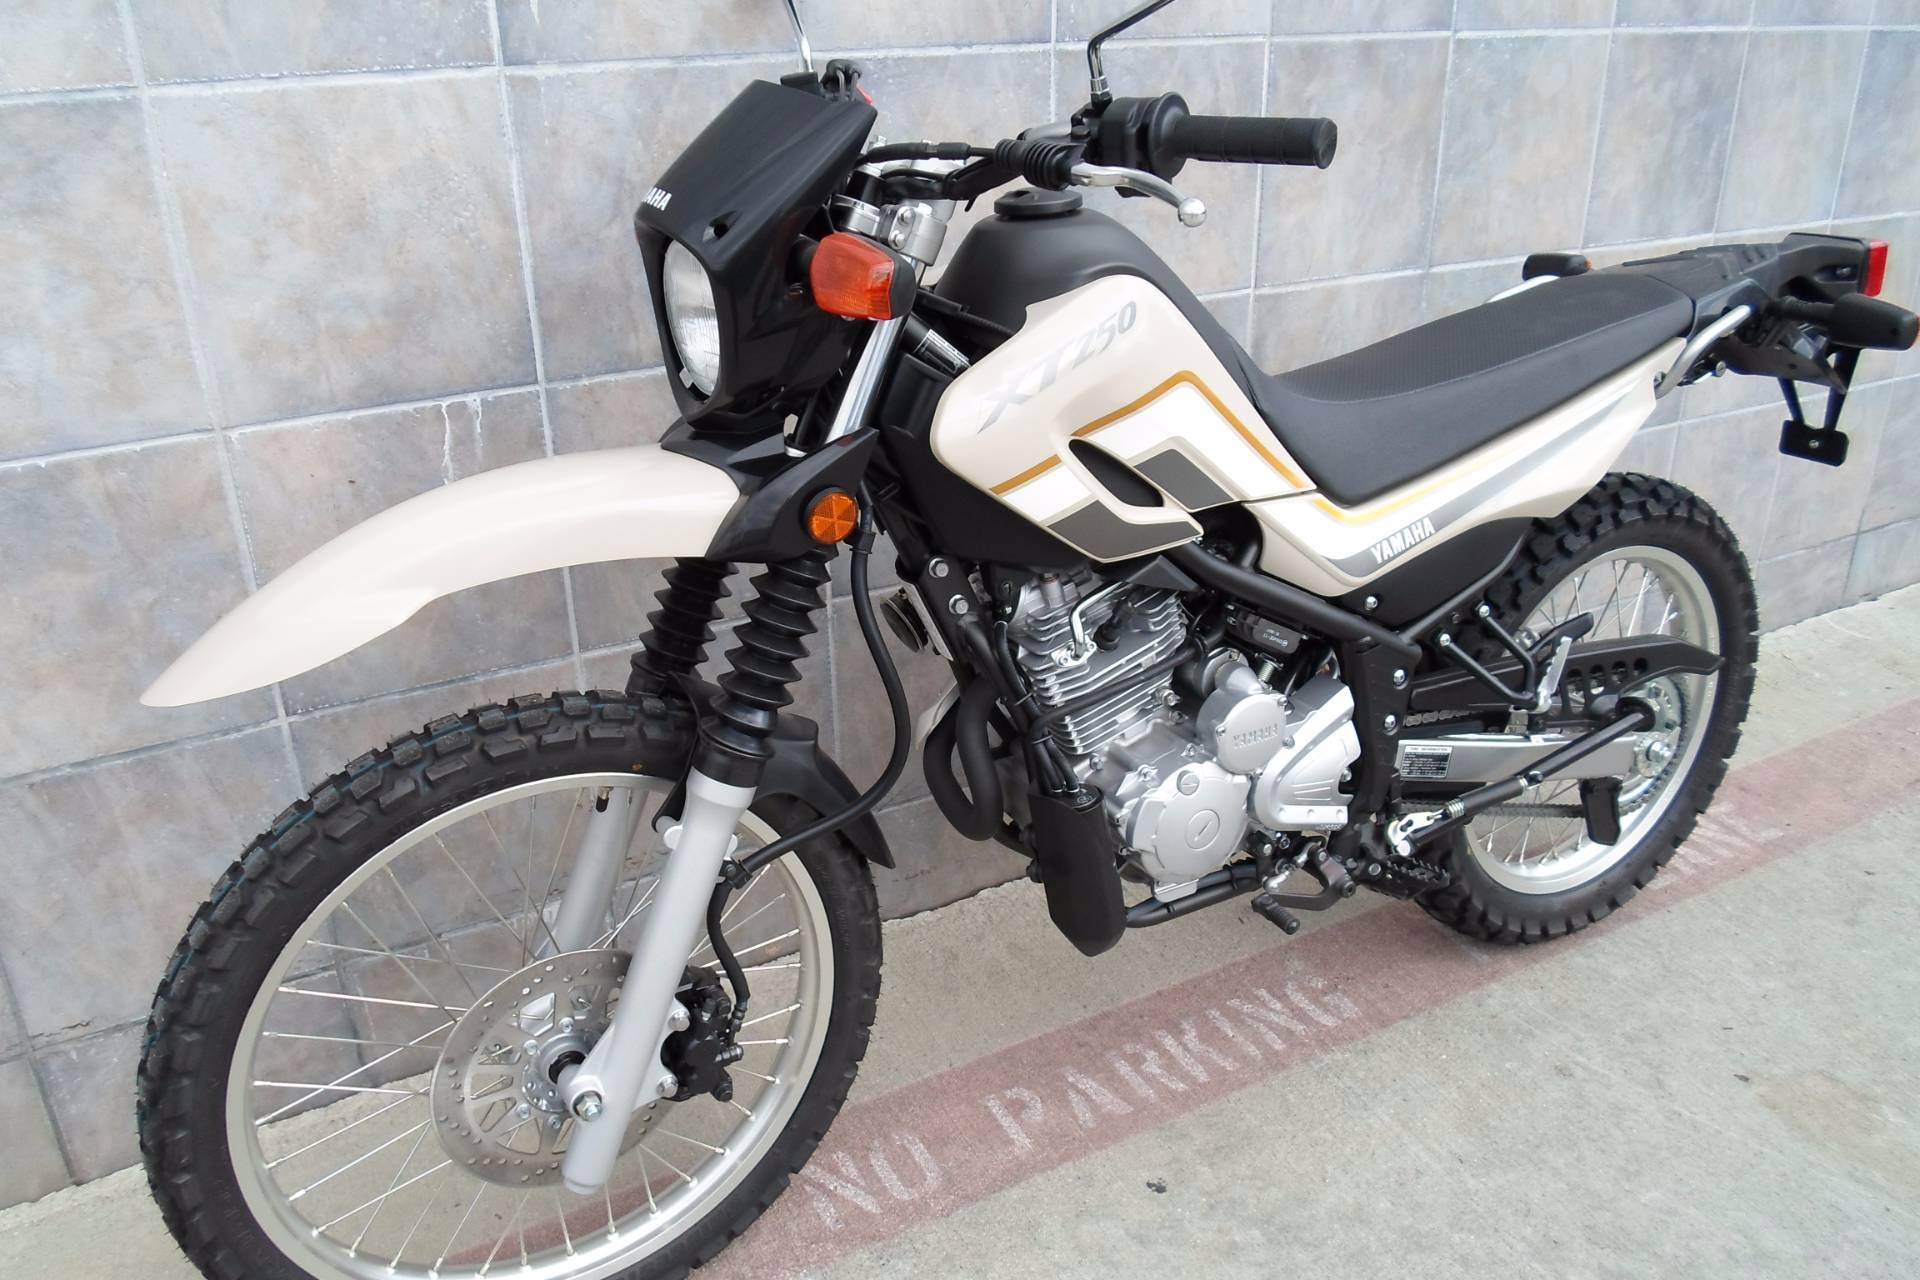 New 2018 Yamaha XT250 Motorcycles in San Marcos, CA